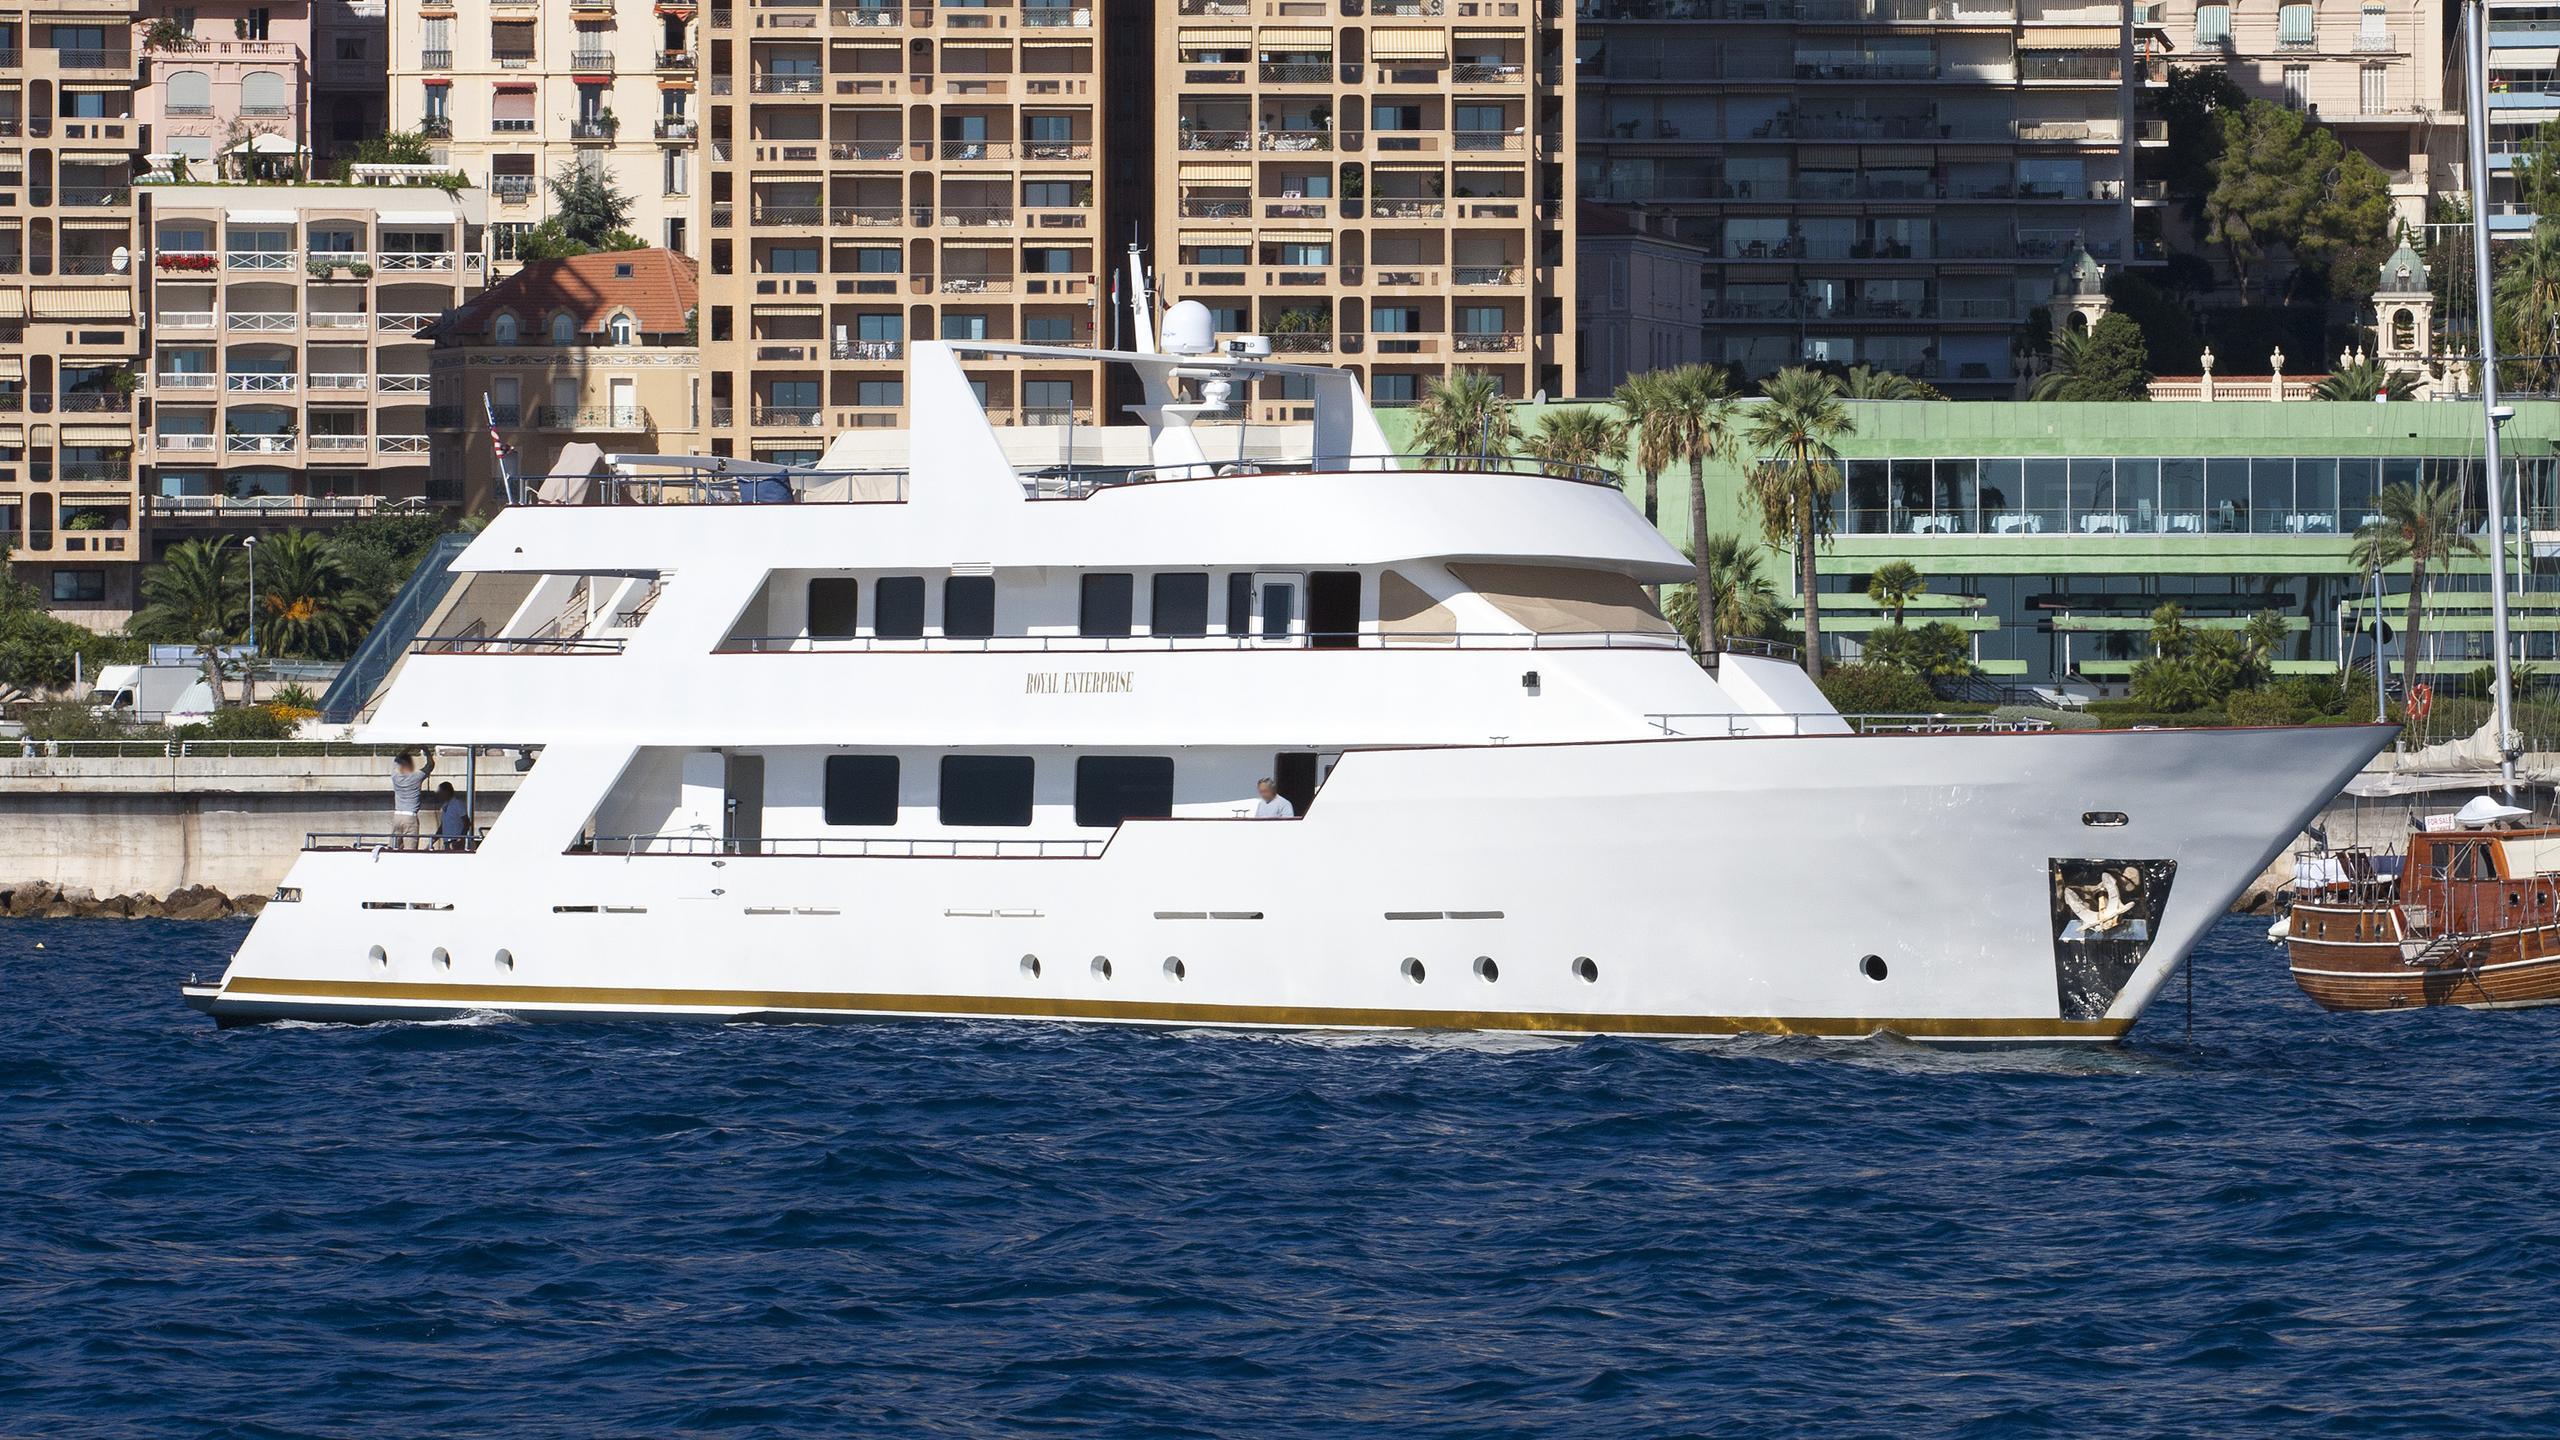 royal-enterprise-motor-yacht-aegean-yachts-2006-32m-half-profile